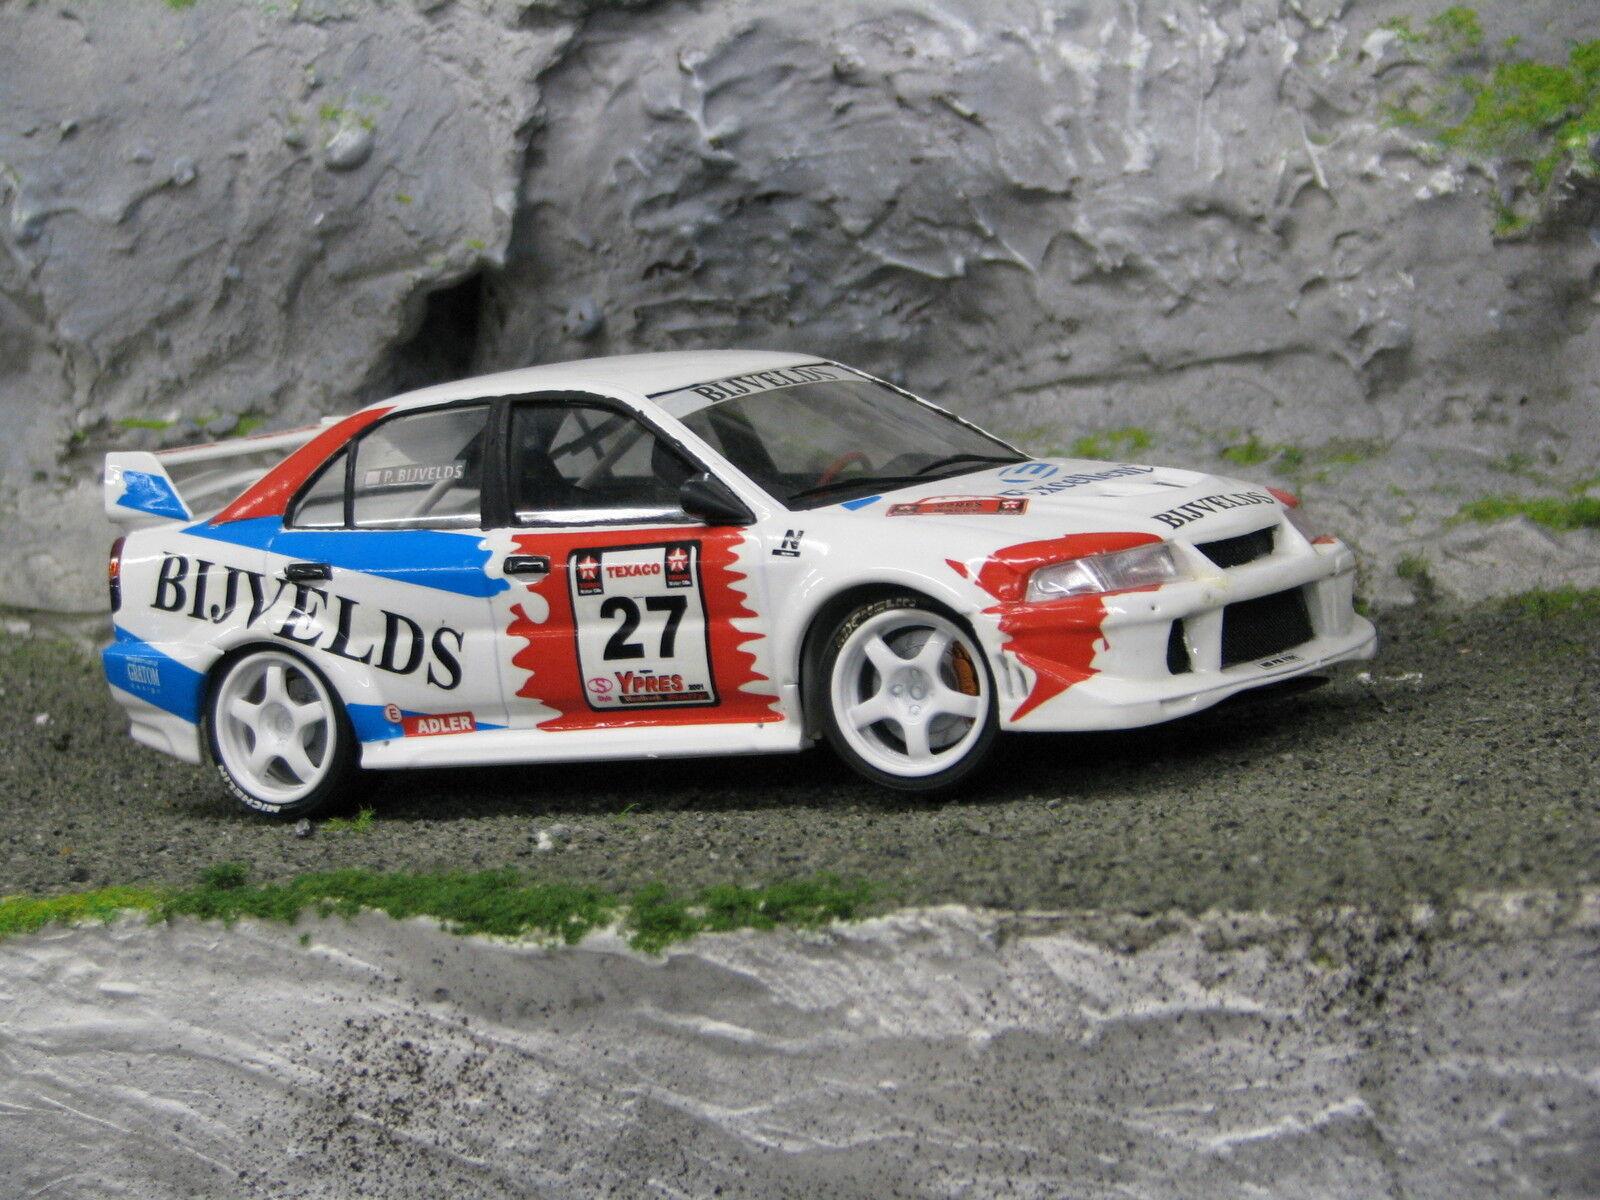 QSP Mitsubishi Mitsubishi Mitsubishi Lancer Evo Vl 1 24  27 Bijvelds   Bijvelds Ypres Rally 2001 84c328